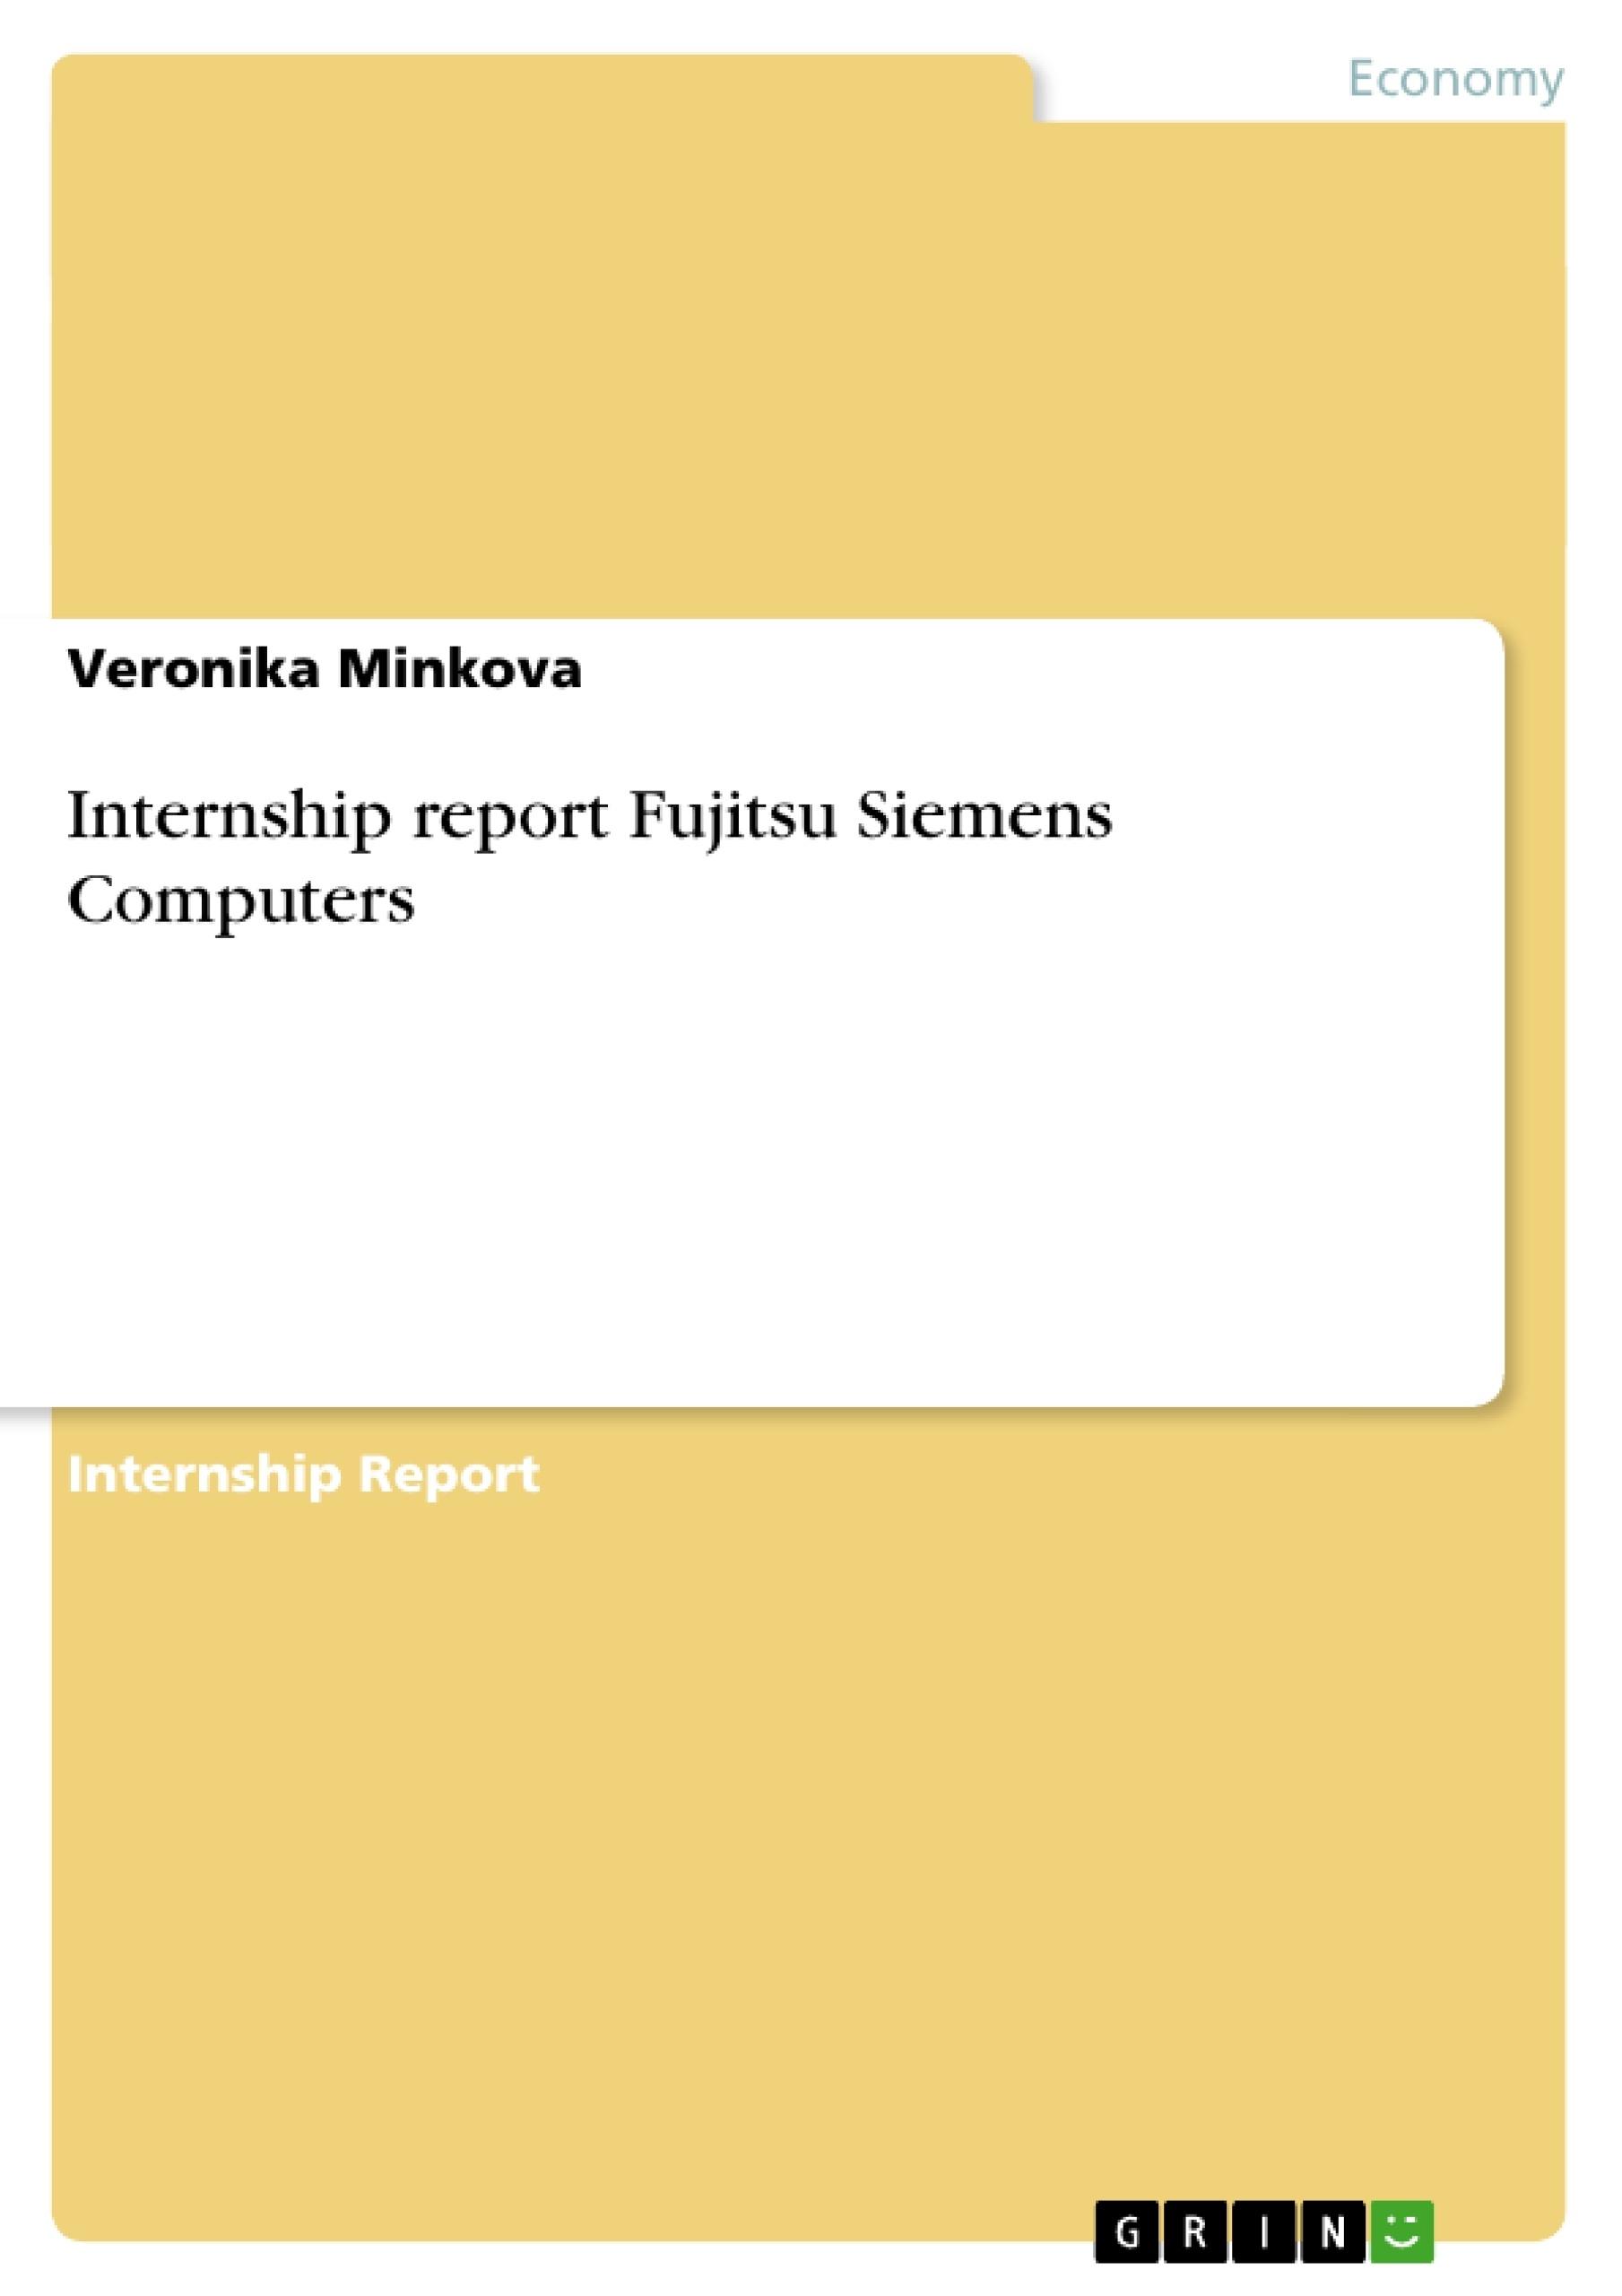 Title: Internship report Fujitsu Siemens Computers